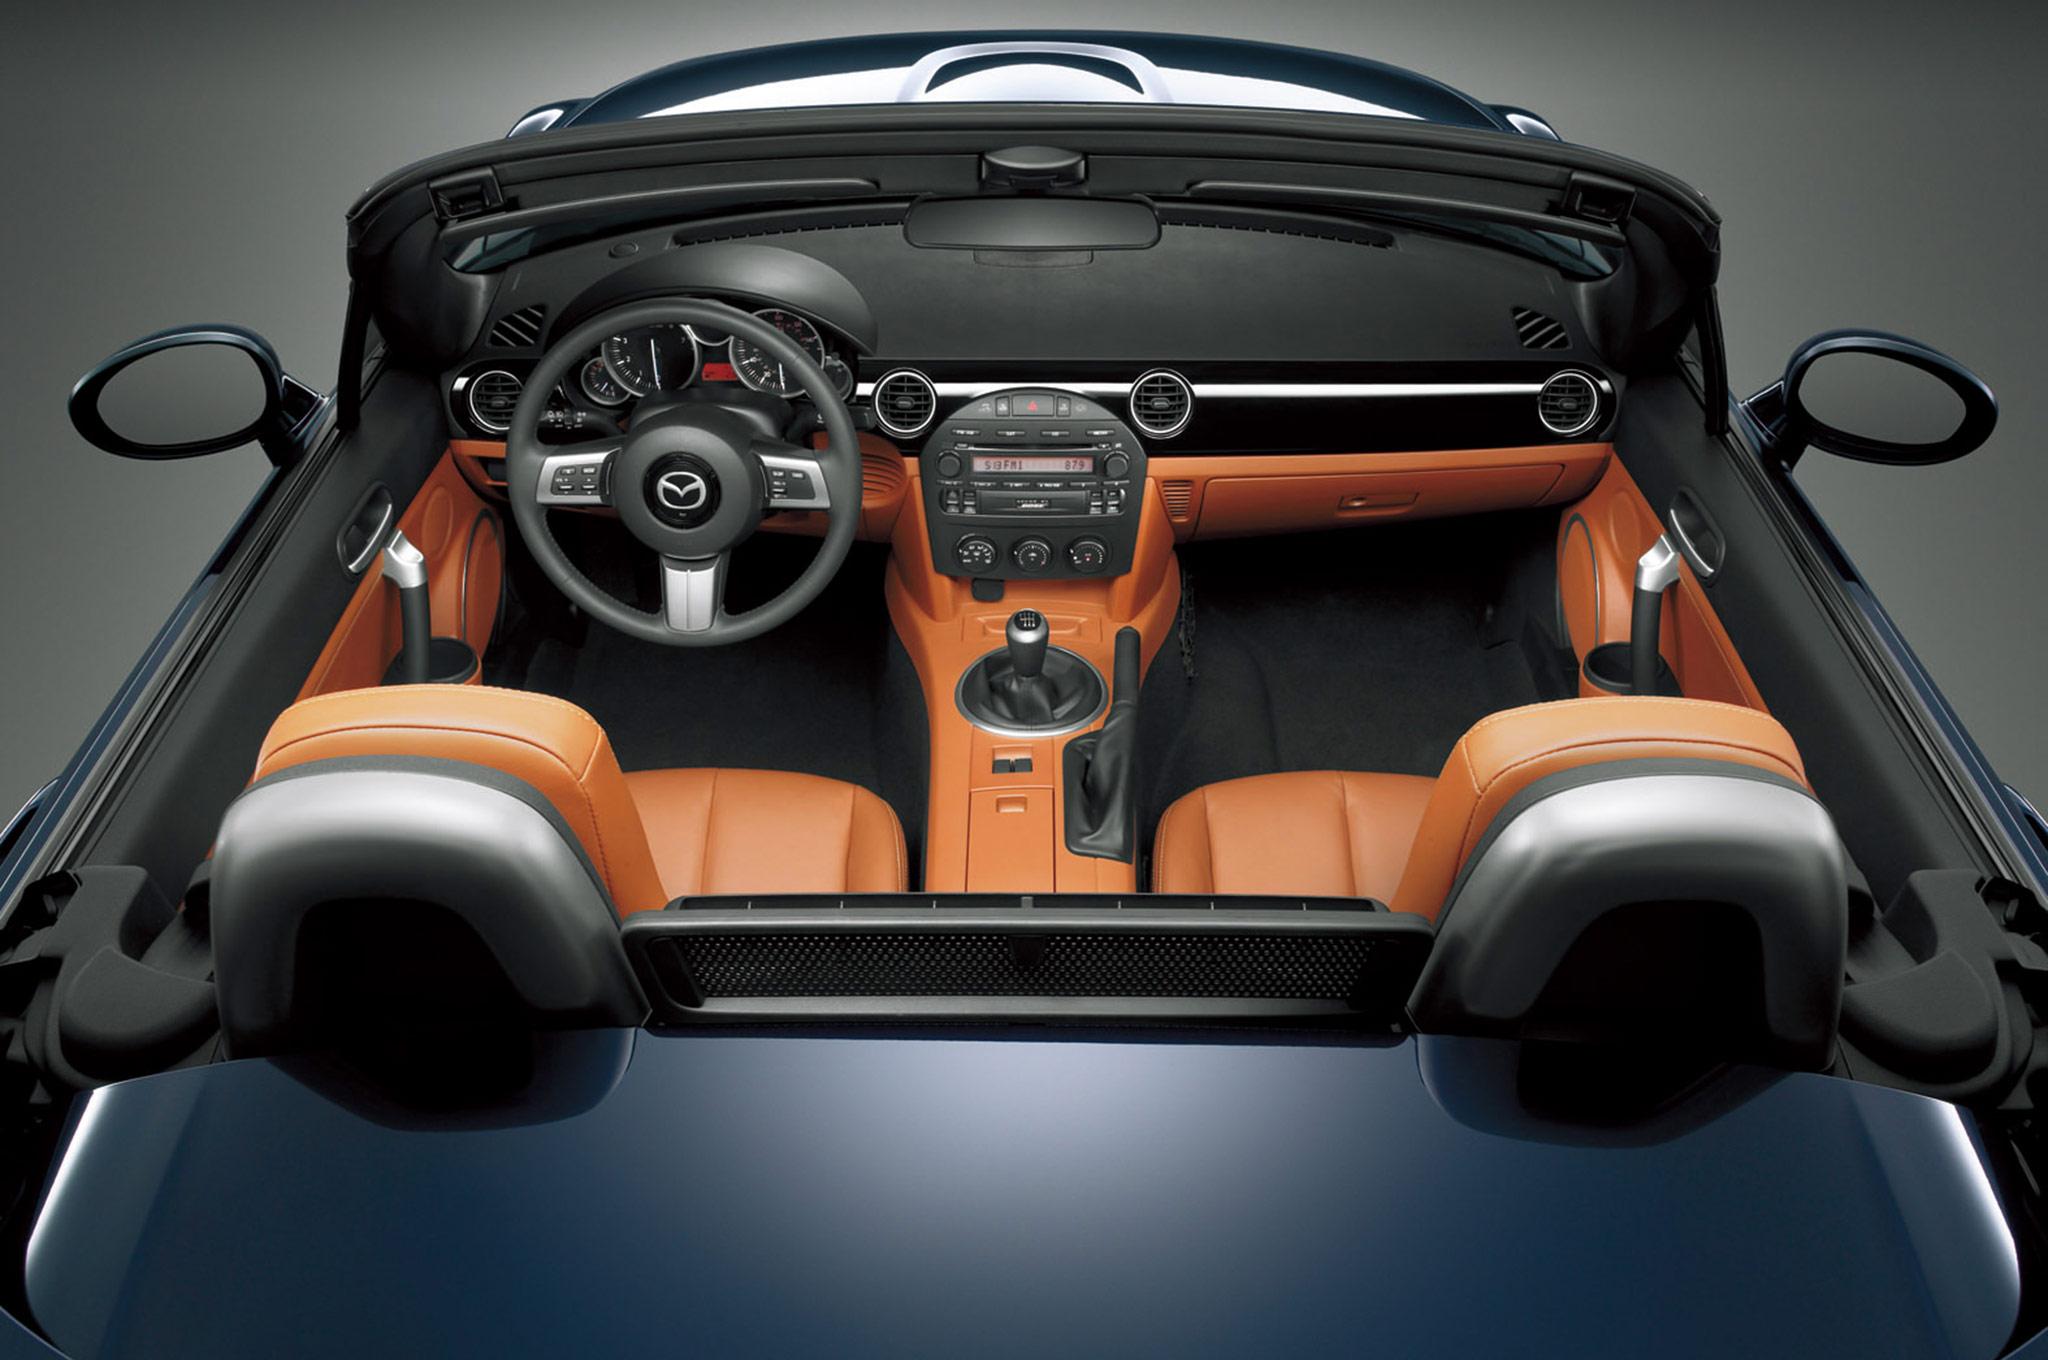 2006 mazda mx 5 miata technical introduction rh automobilemag com 2018 MX-5 Miata 2016 MX-5 Miata